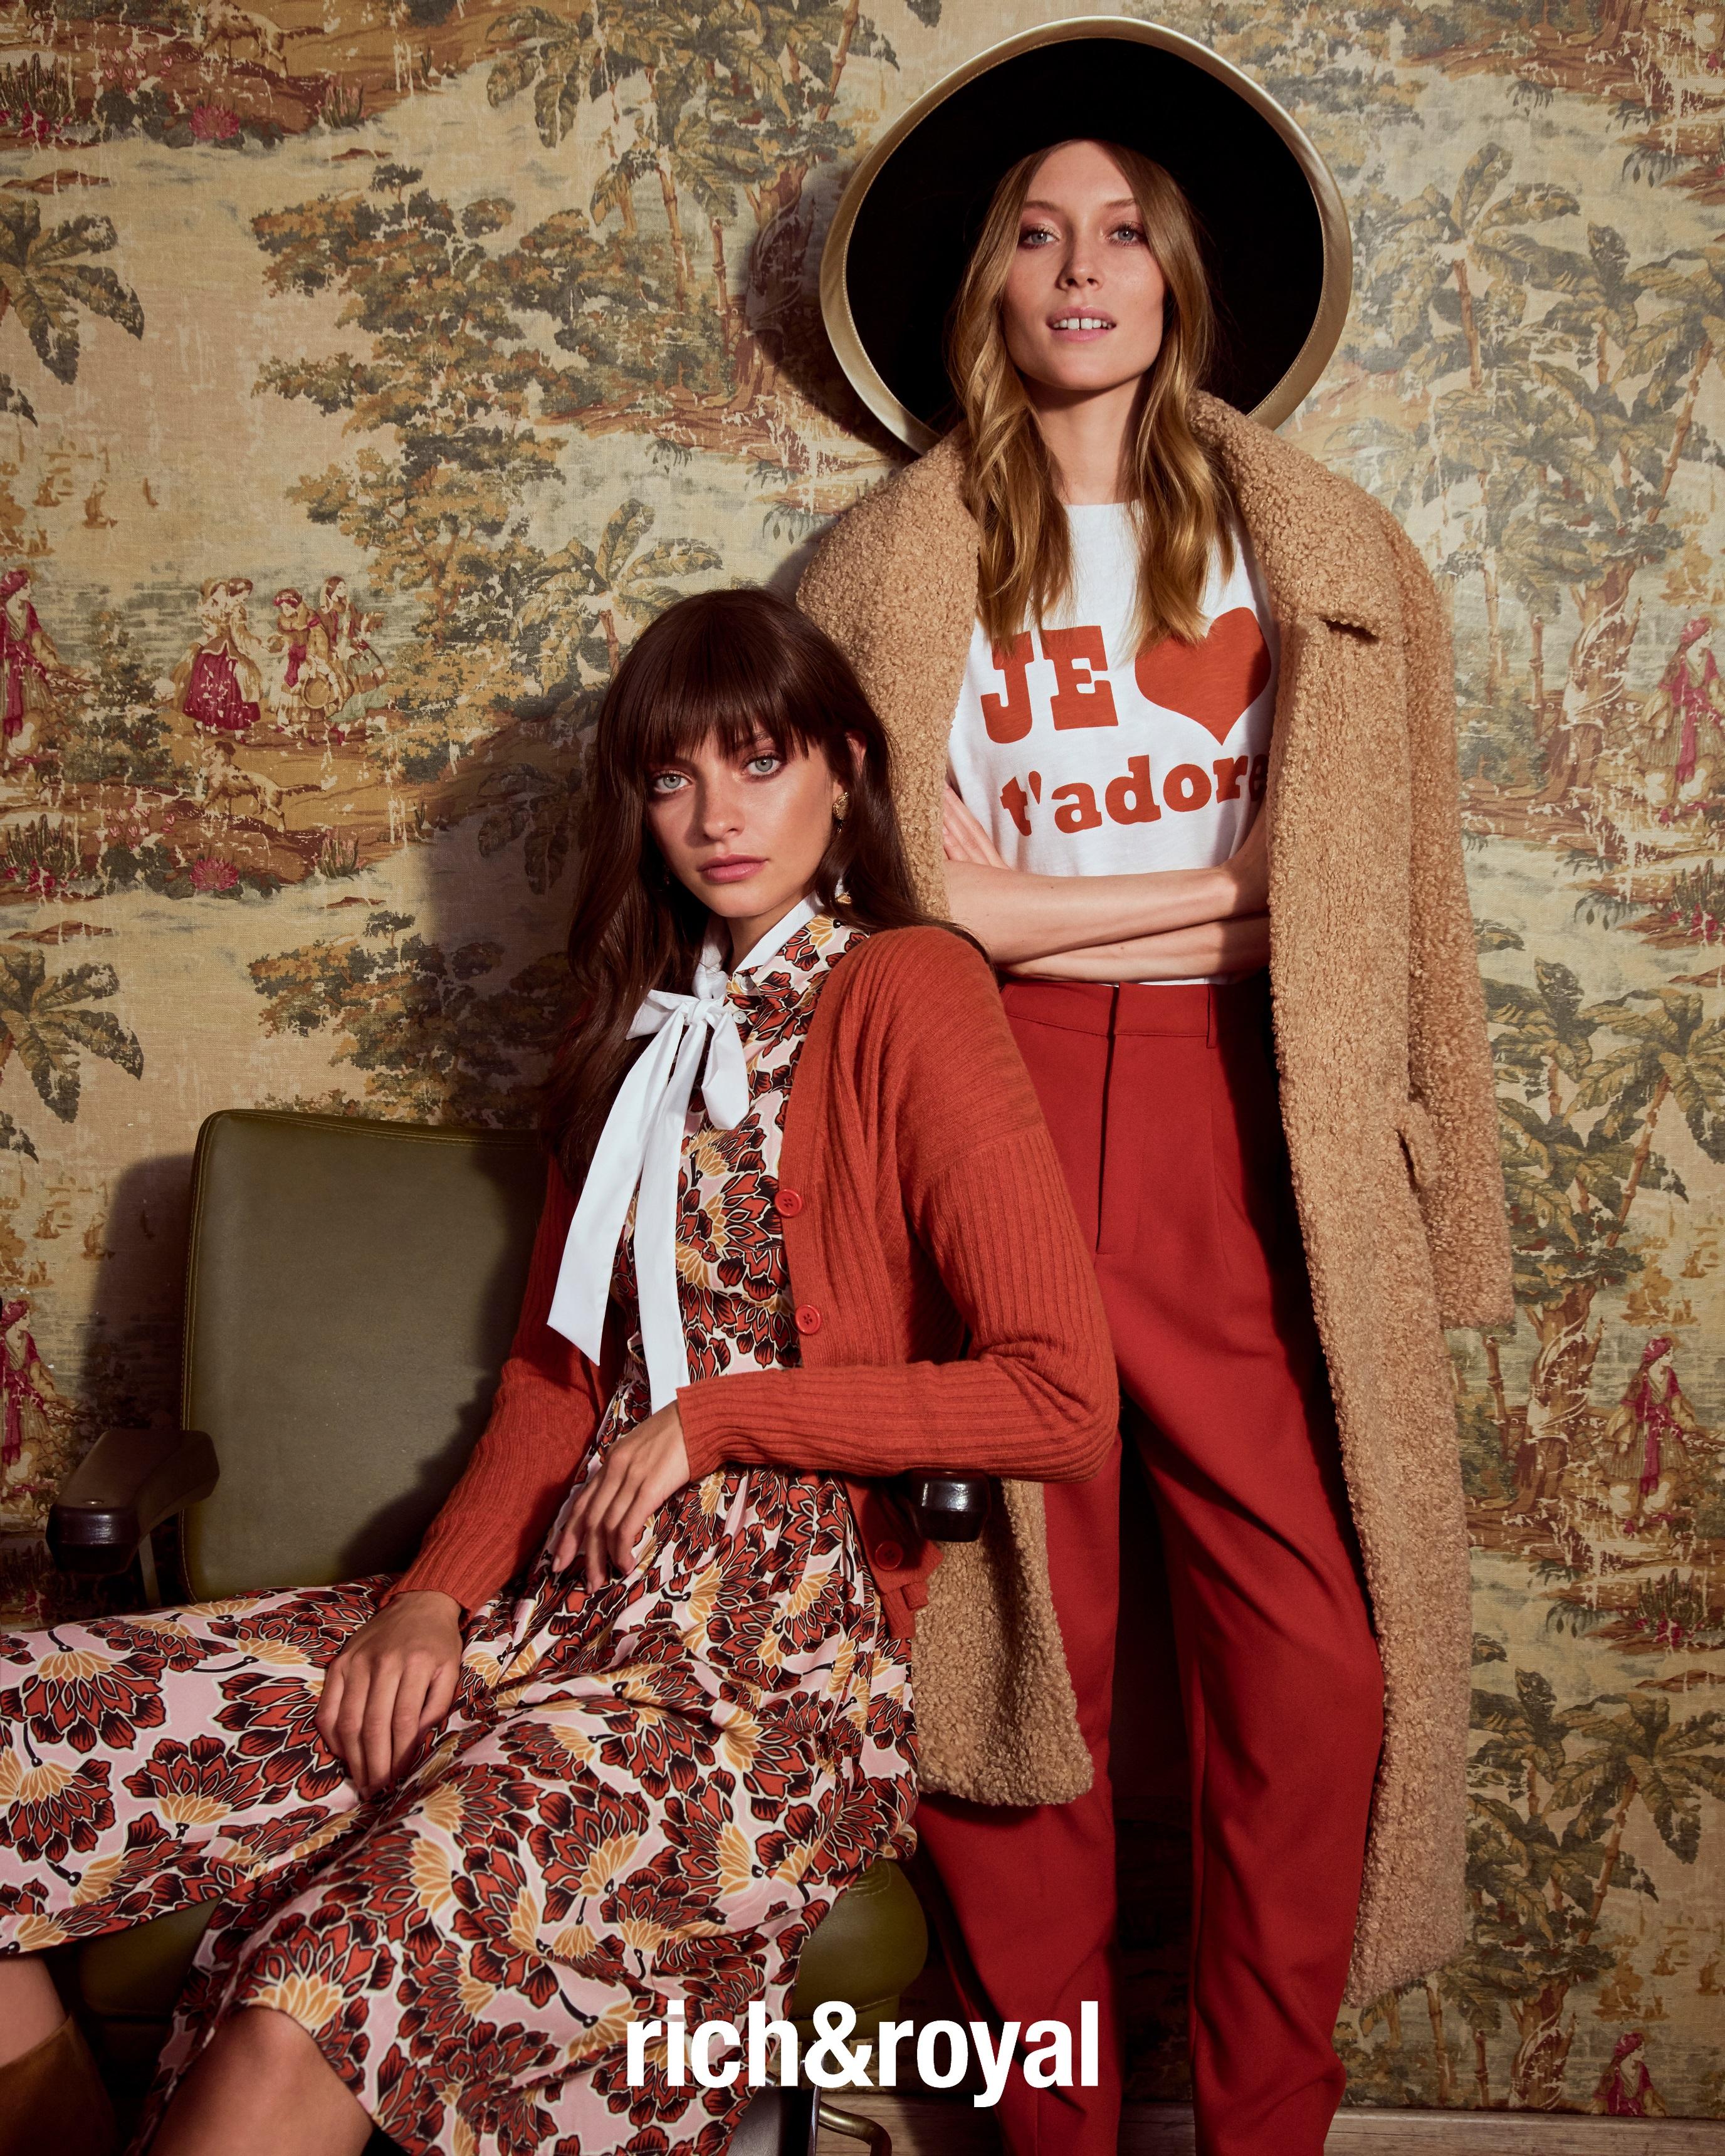 Bea Mode Entdecken Sie Italienische Mode Fur Damen Bei Bea Mode